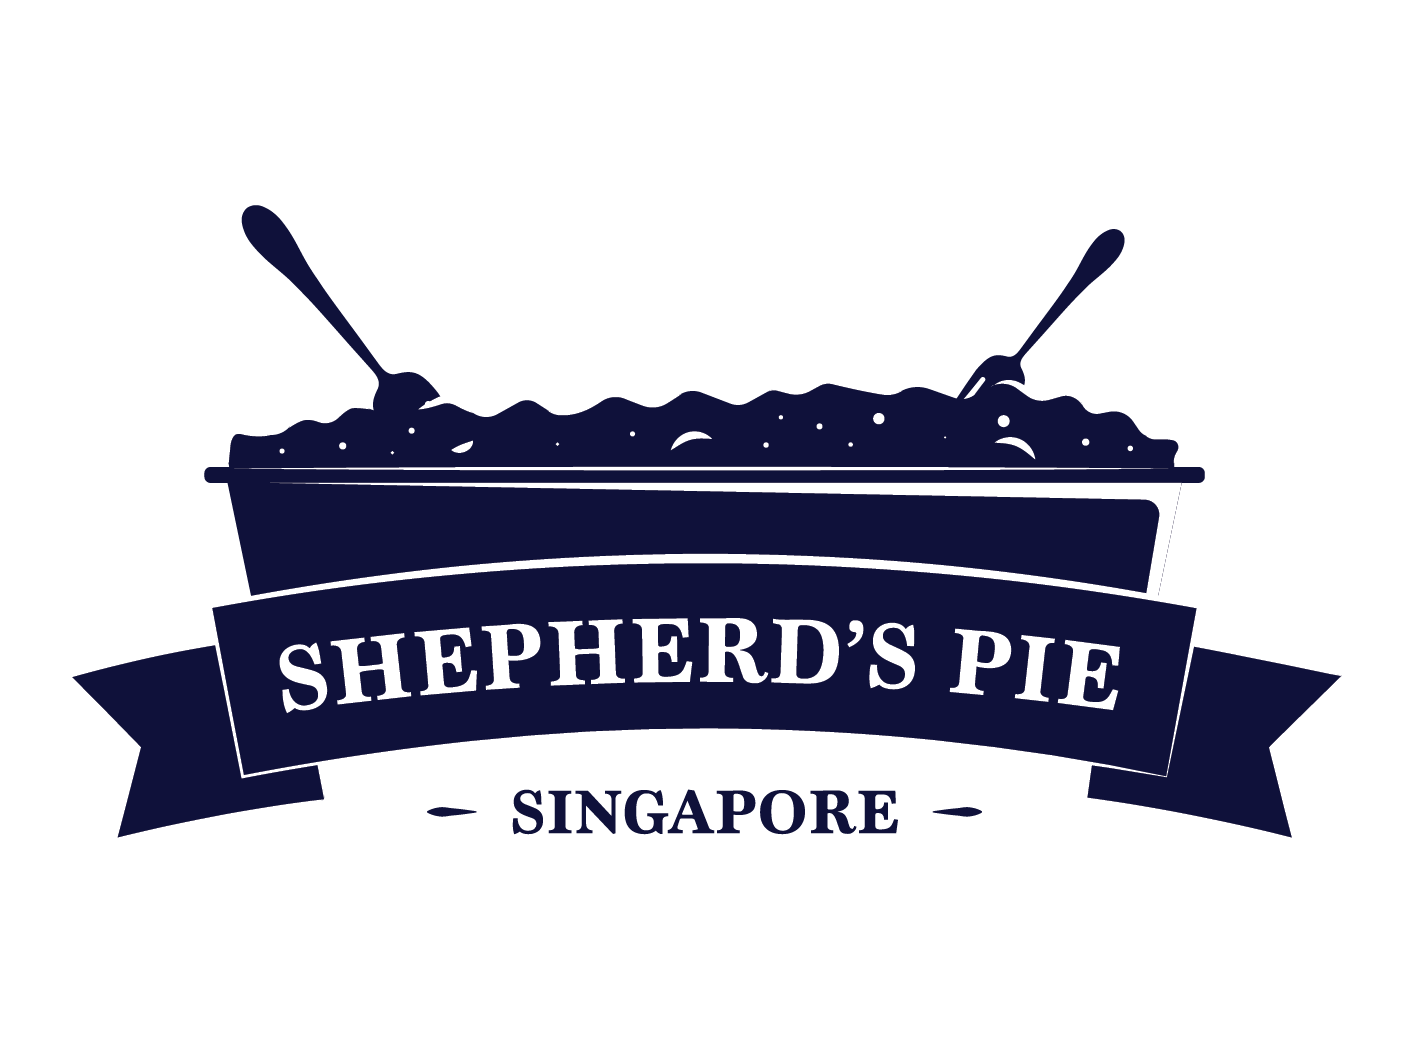 Shepherd's Pie Singapore | Authentic British Shepherd Pie in Singapore